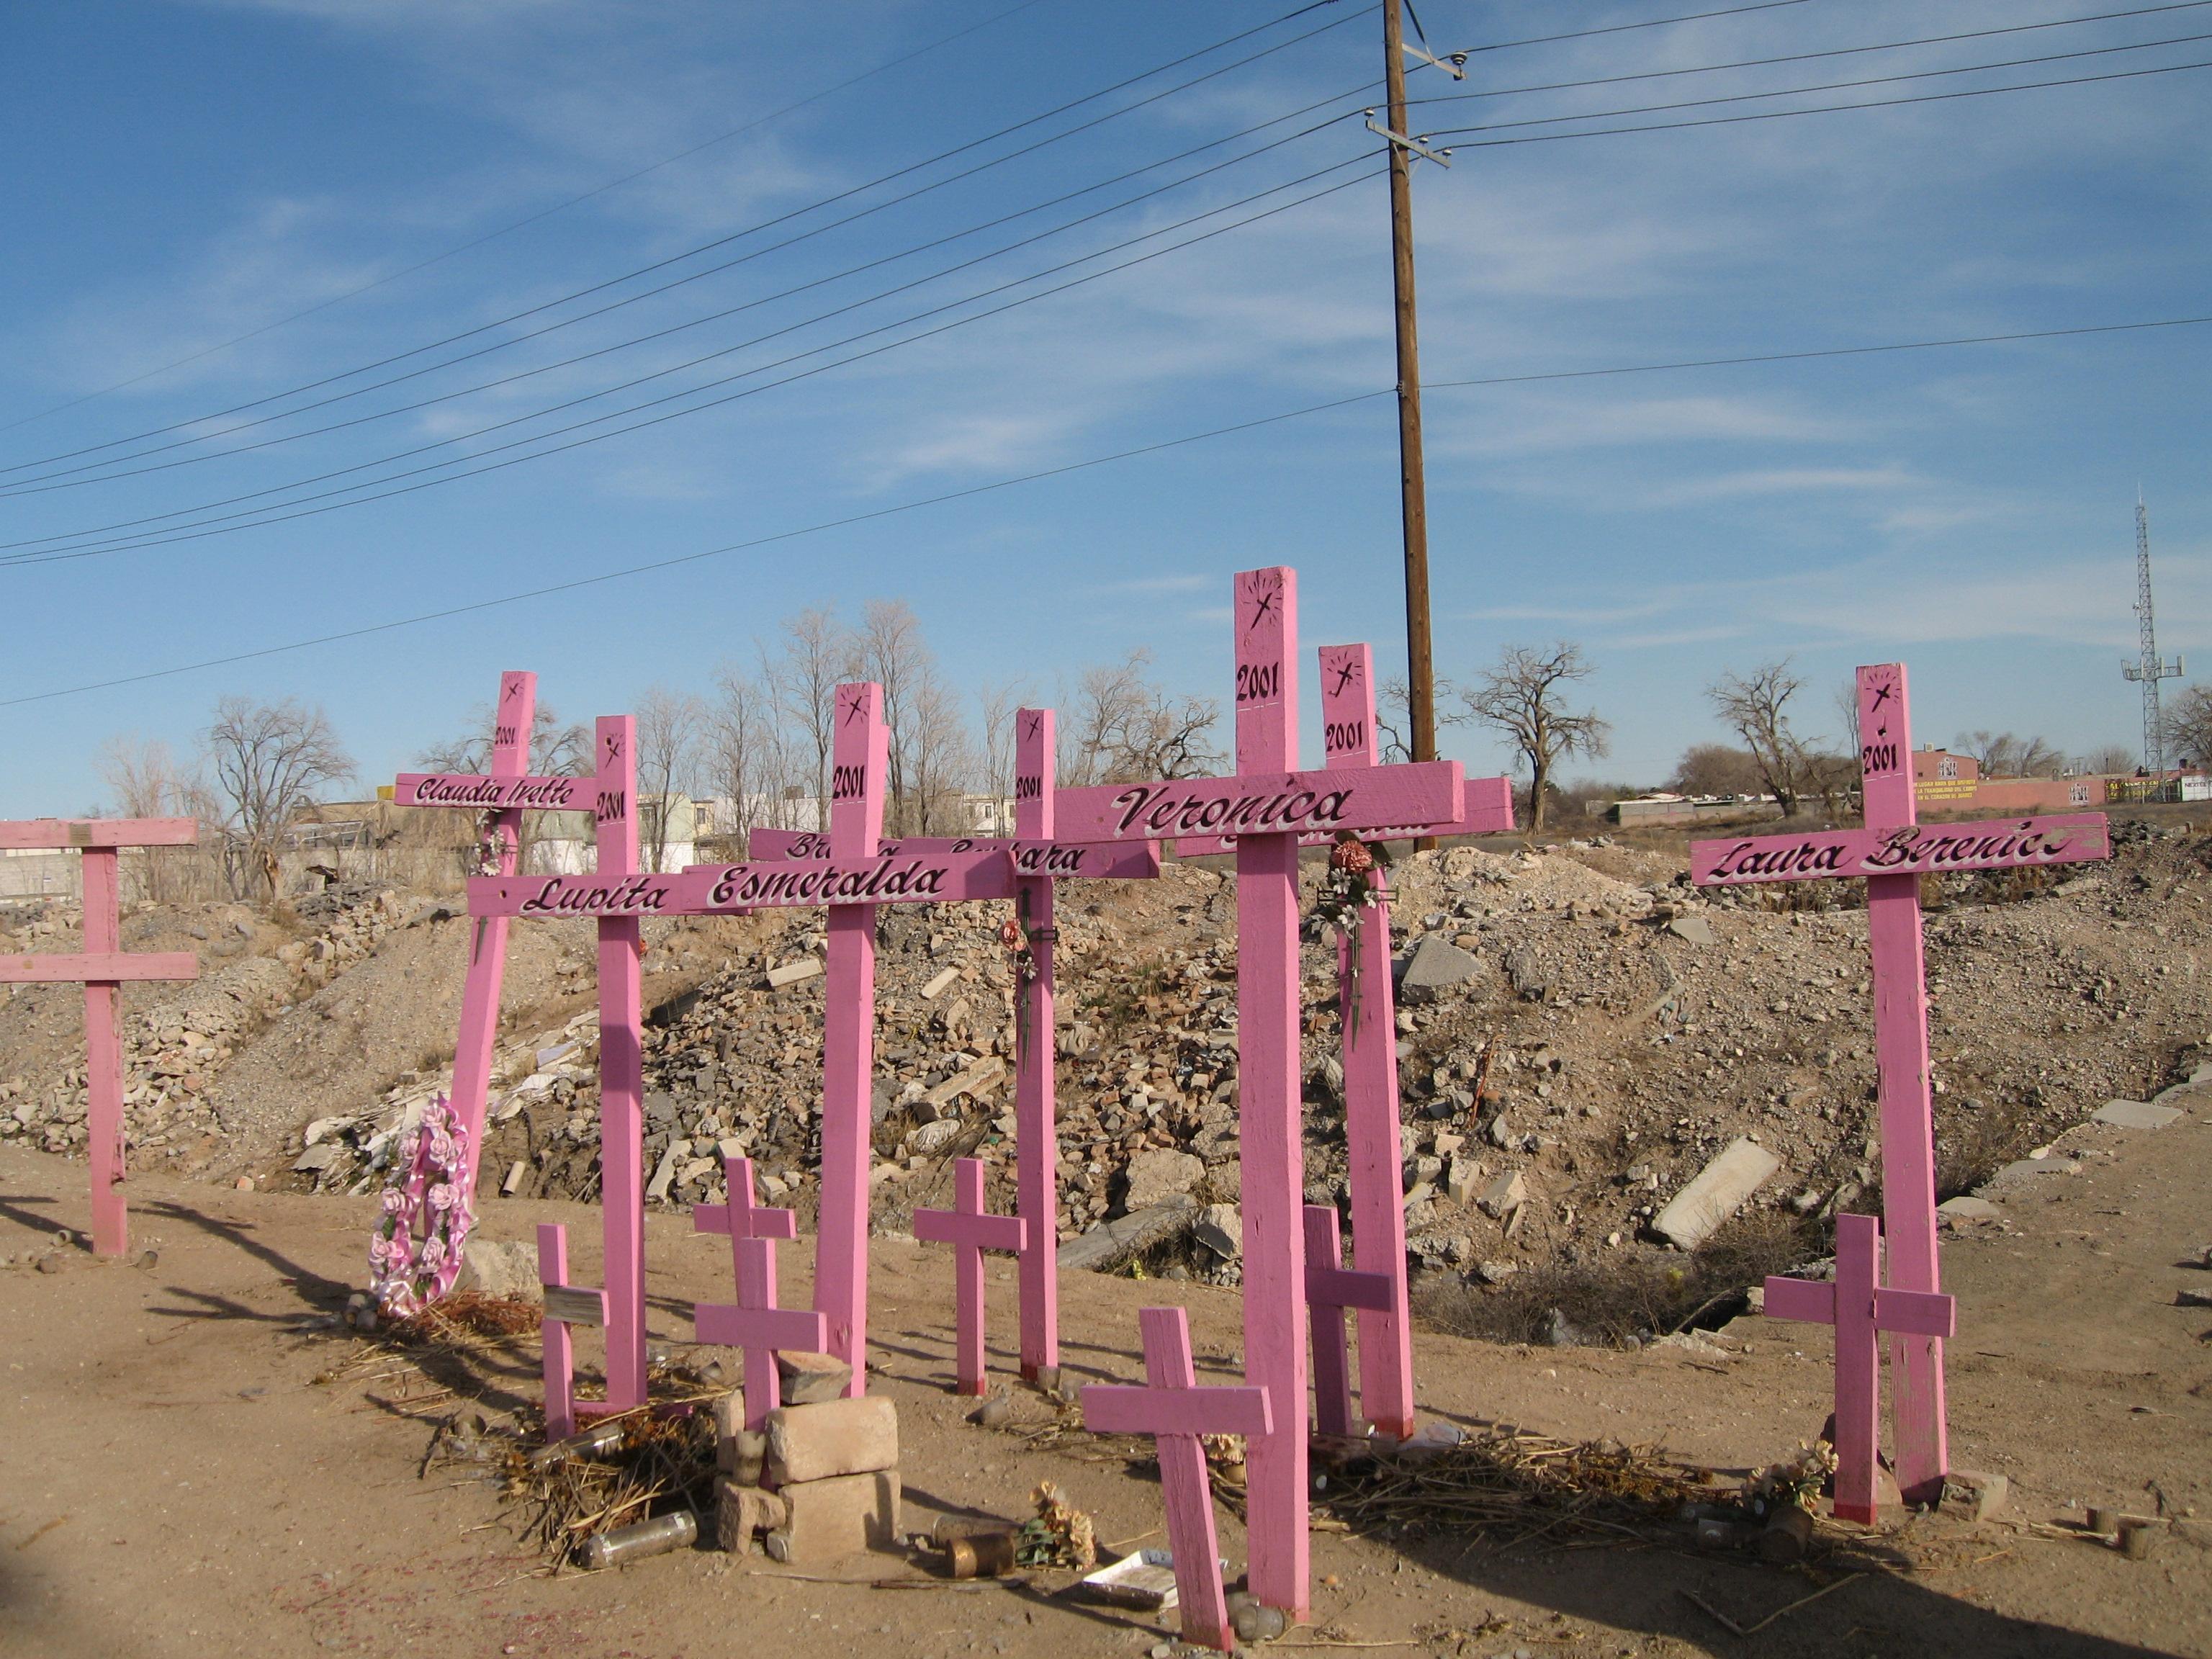 Juarez Killings Of Women